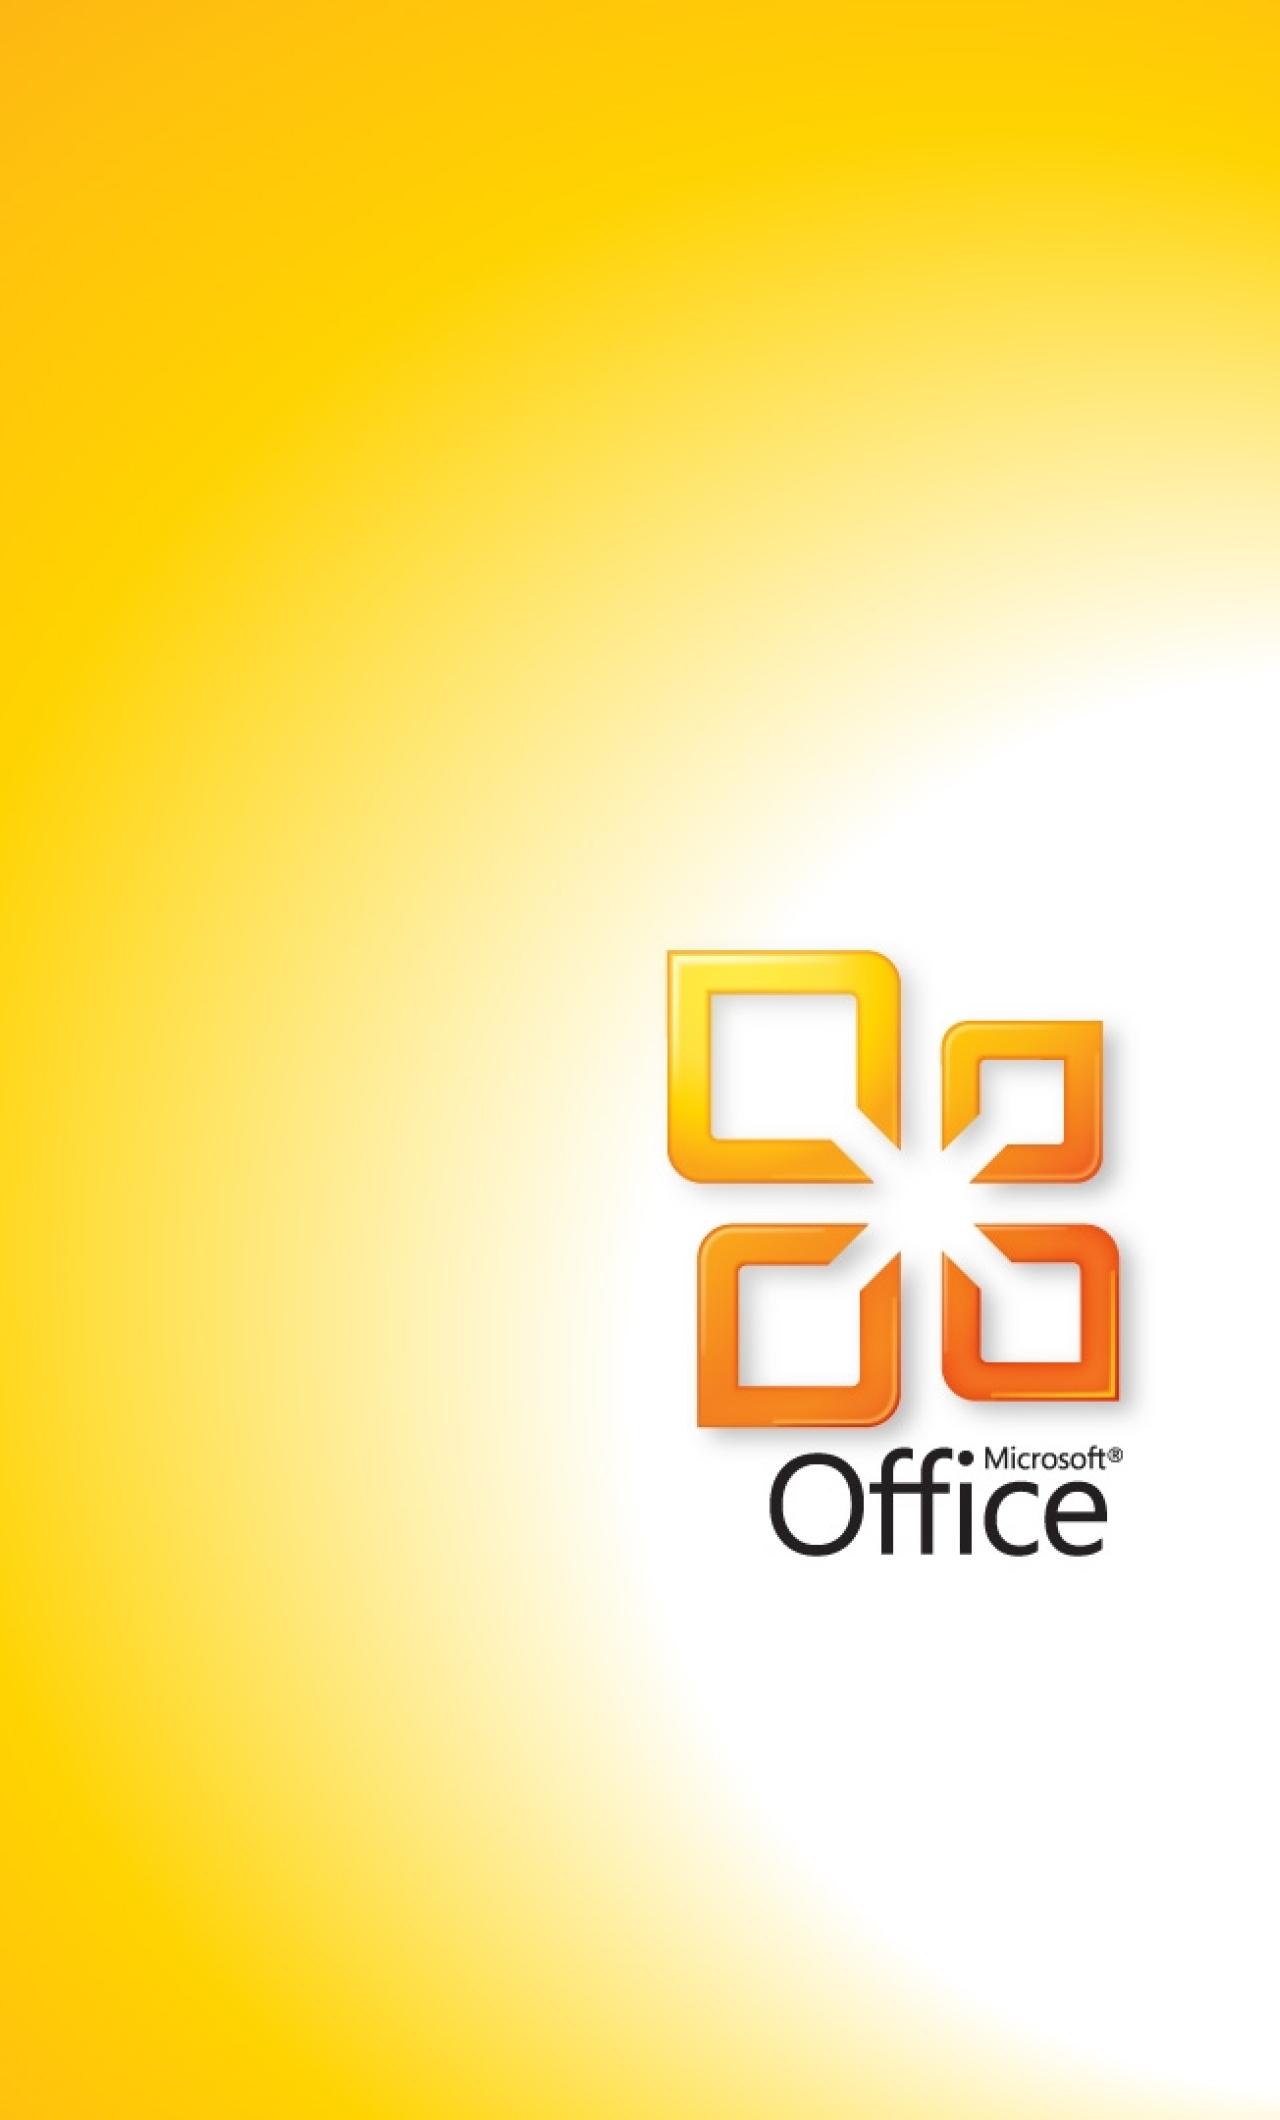 Download Microsoft Office Yellow 1280x2120 Resolution Full HD